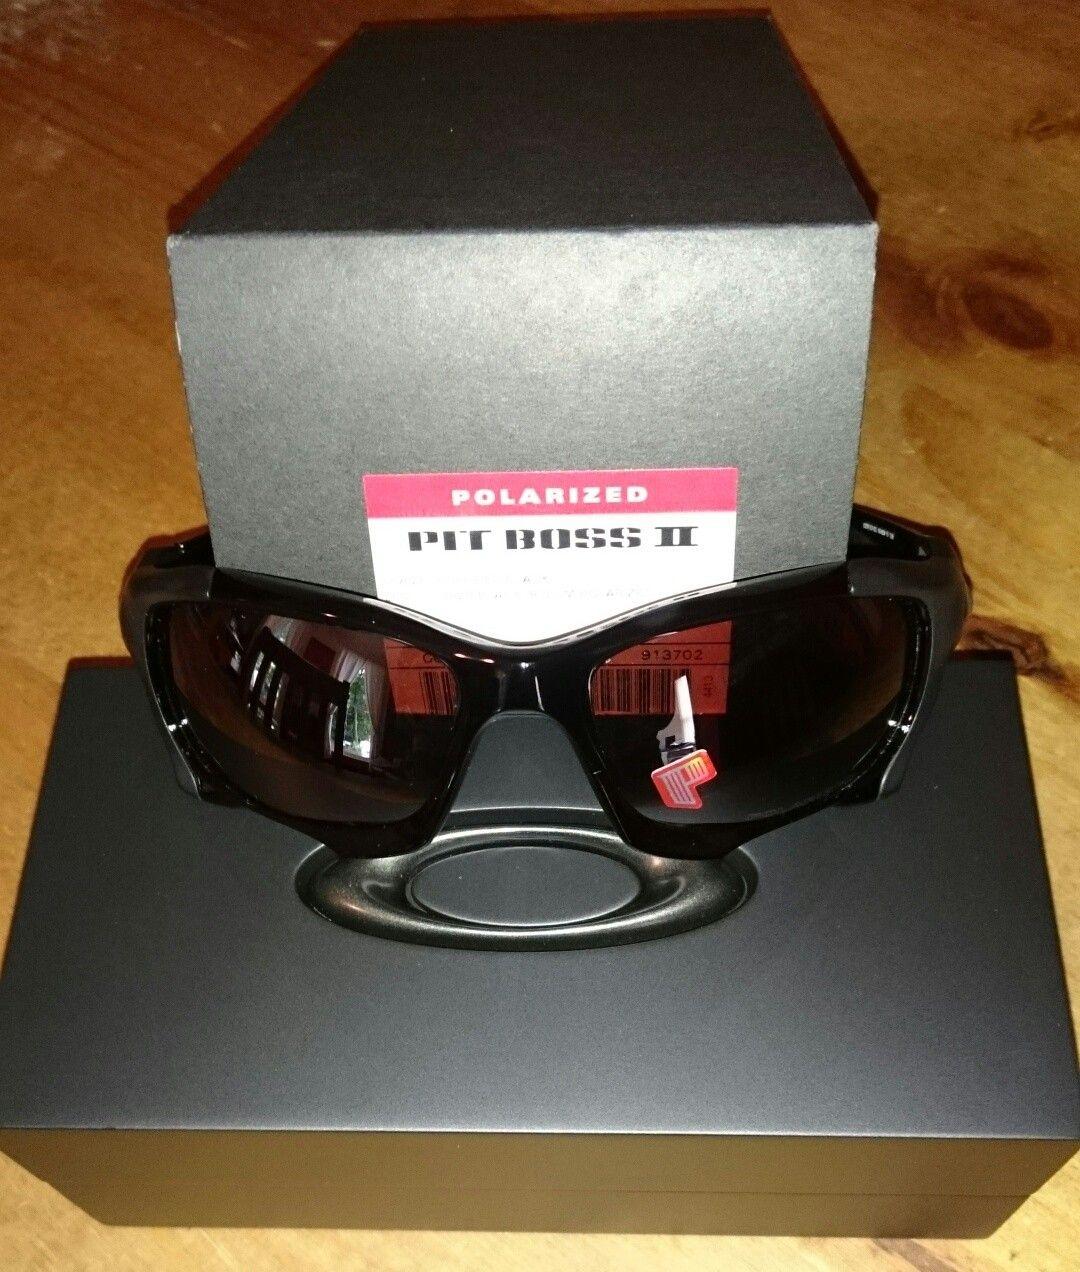 BNIB: PB2 for X-metal Juliet ** Now in sunglasses exchange ** - IMG_20150814_162822.JPG